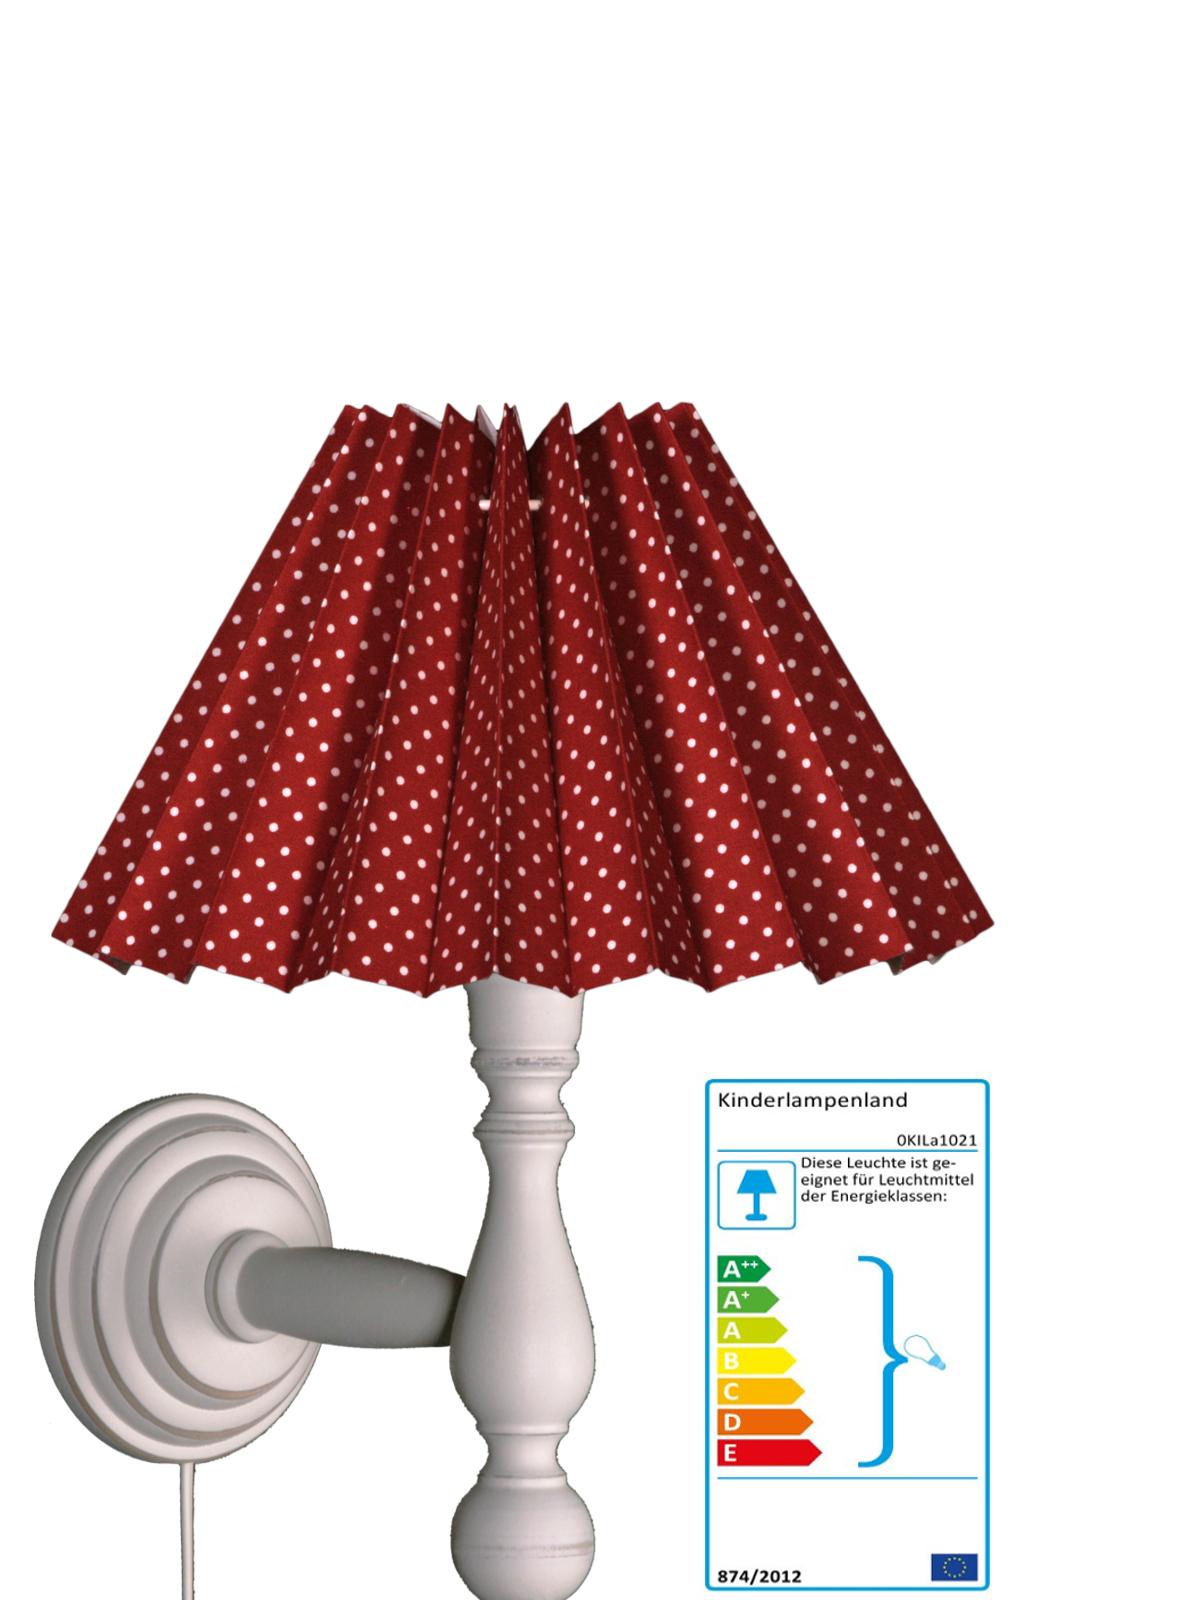 wandlampe plisseeschirm tupfen rot wei wandlampen im kinderlampenland kaufen. Black Bedroom Furniture Sets. Home Design Ideas